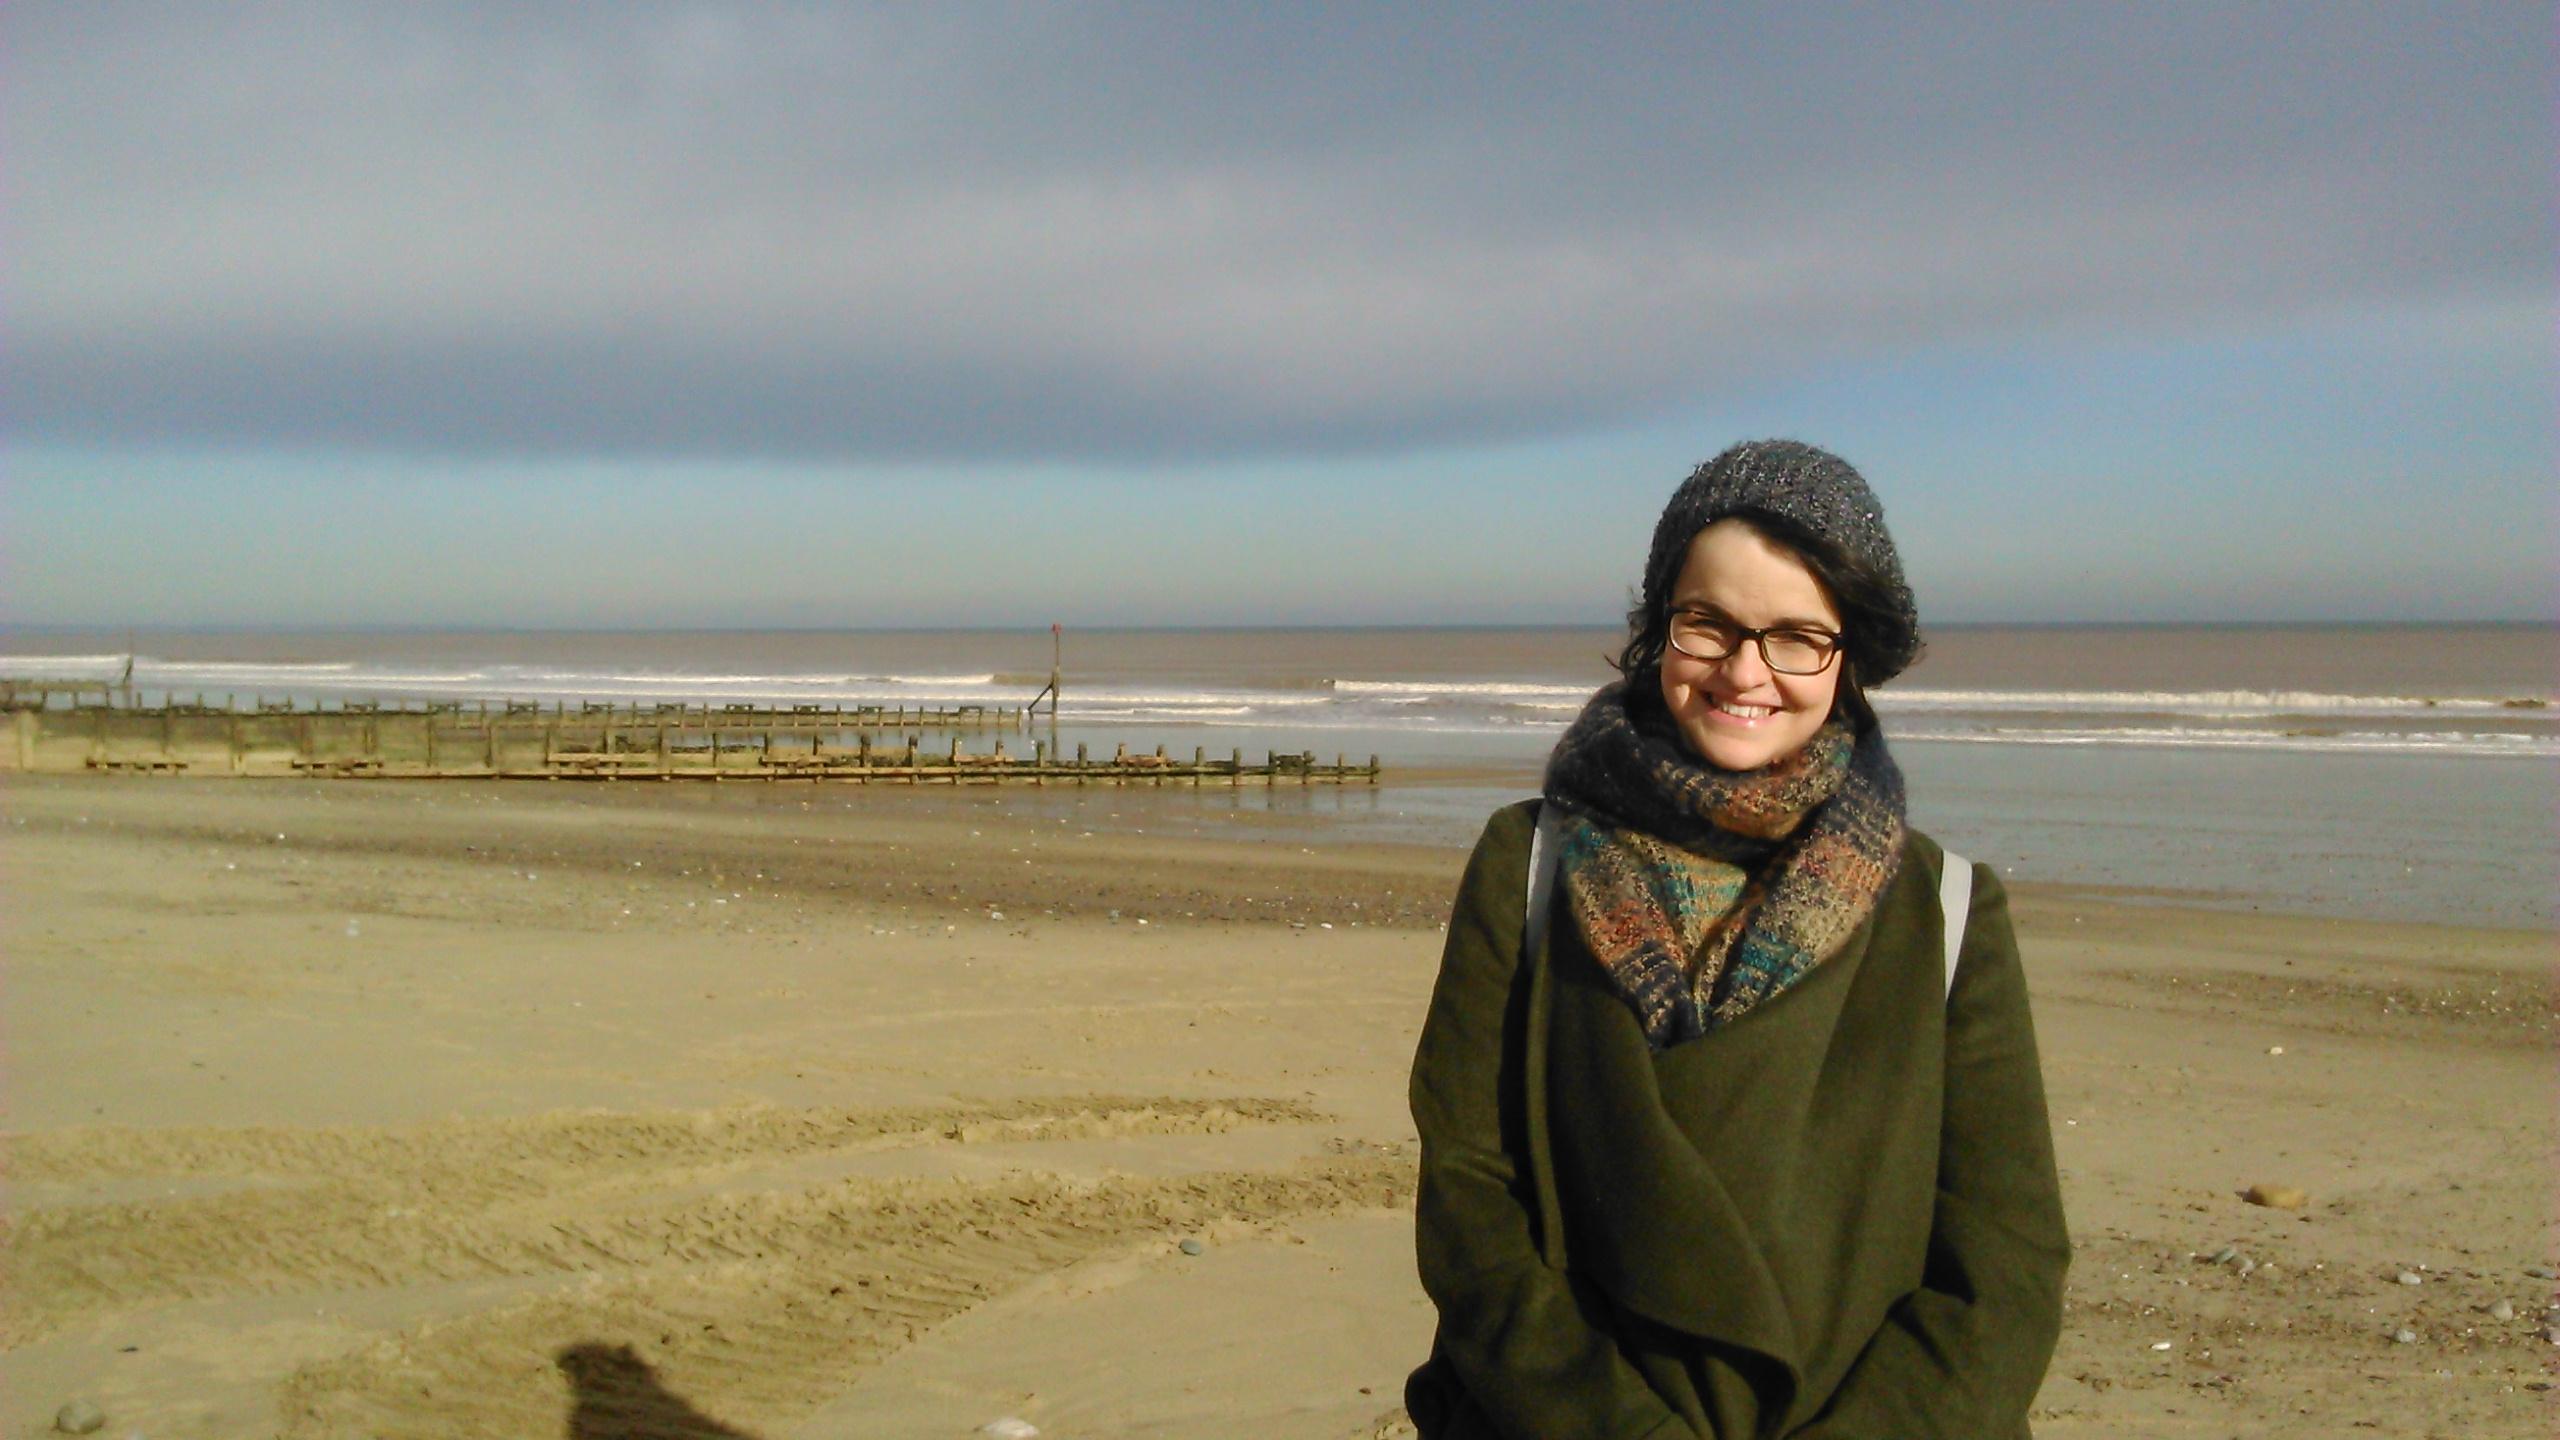 Alex Medcalf on a beach